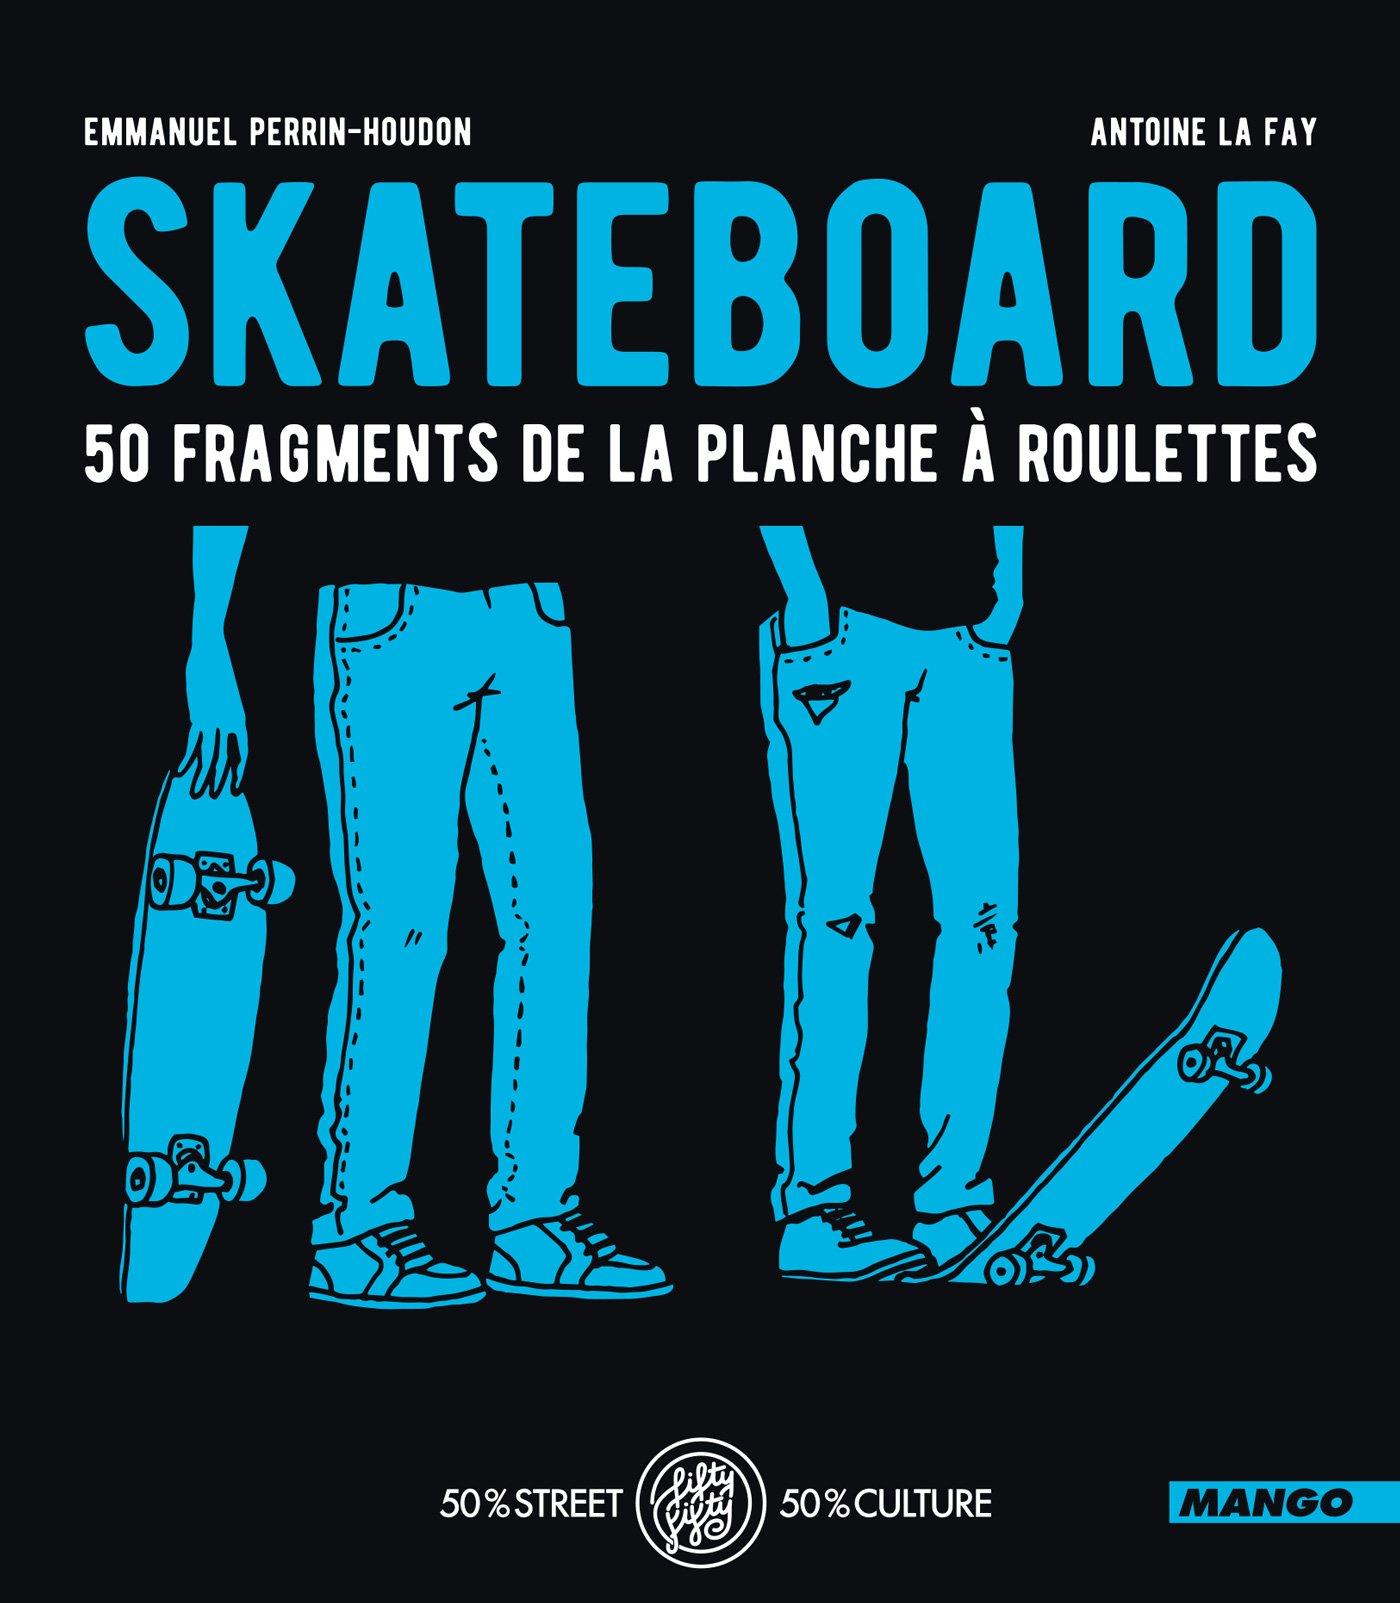 Skateboard - 50 fragments de la planche à roulettes (FIFTY FIFTY) (French Edition)